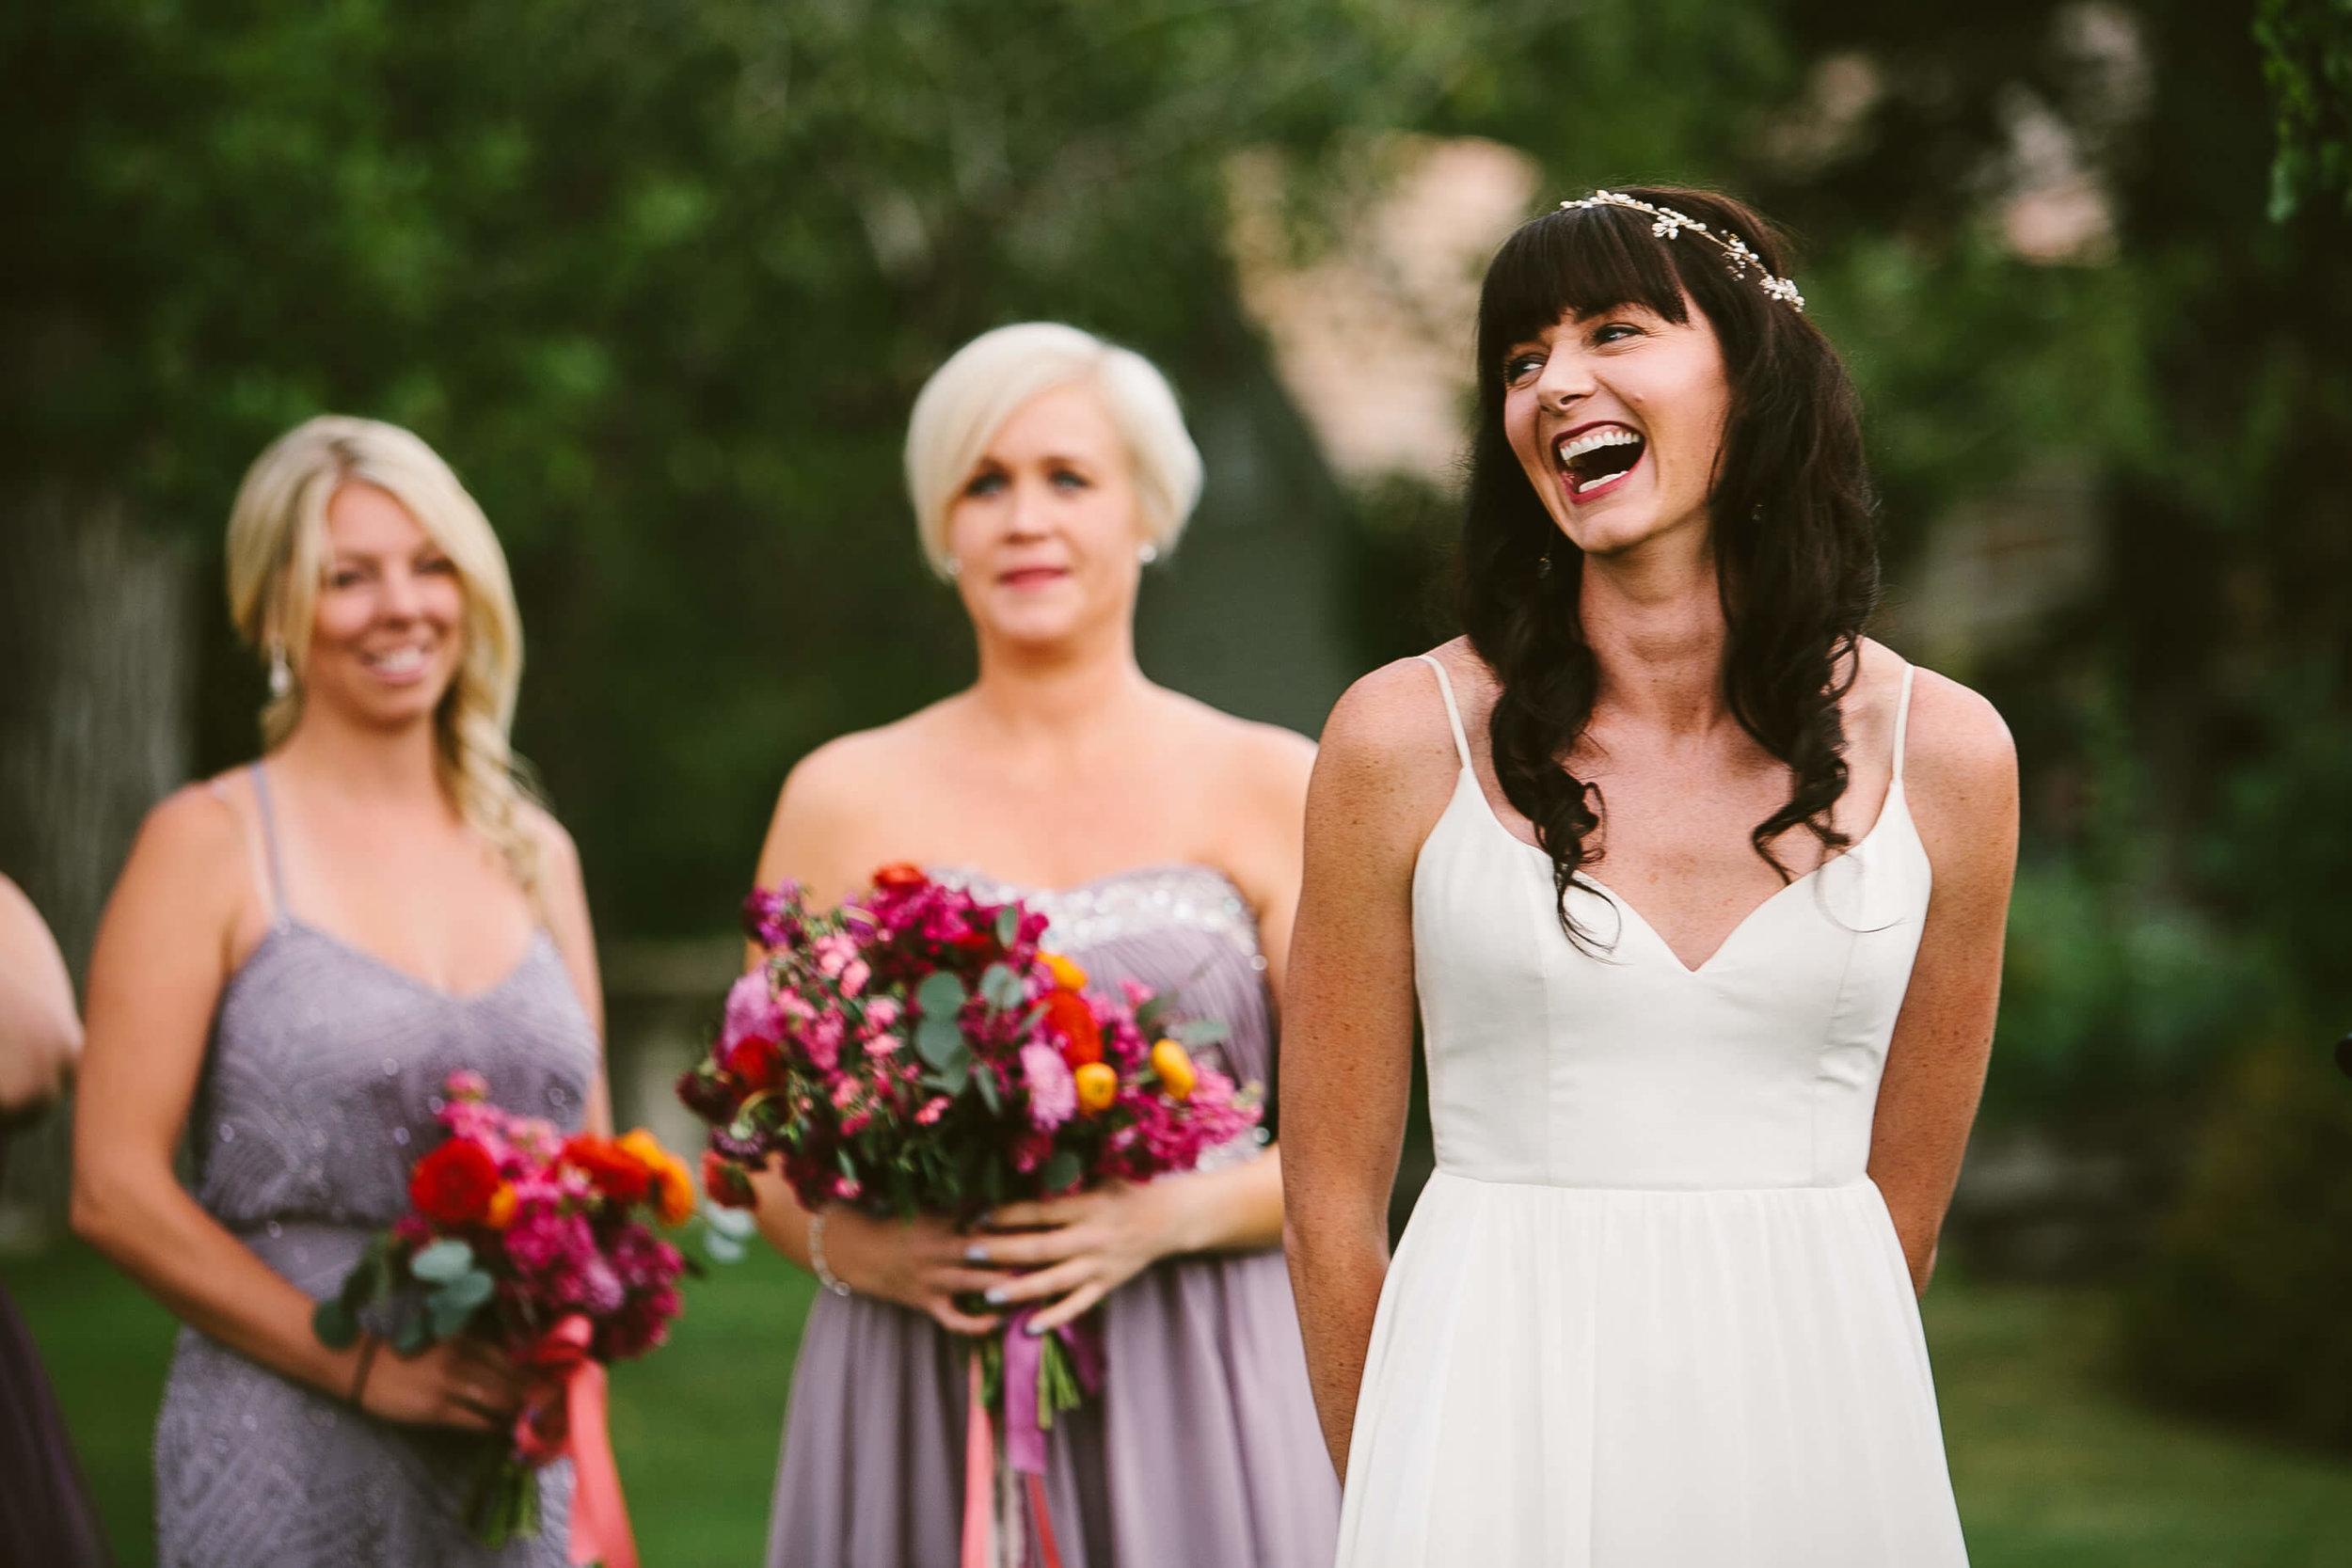 engle-olson-fran-ze-photo-montana-wedding-78.jpg